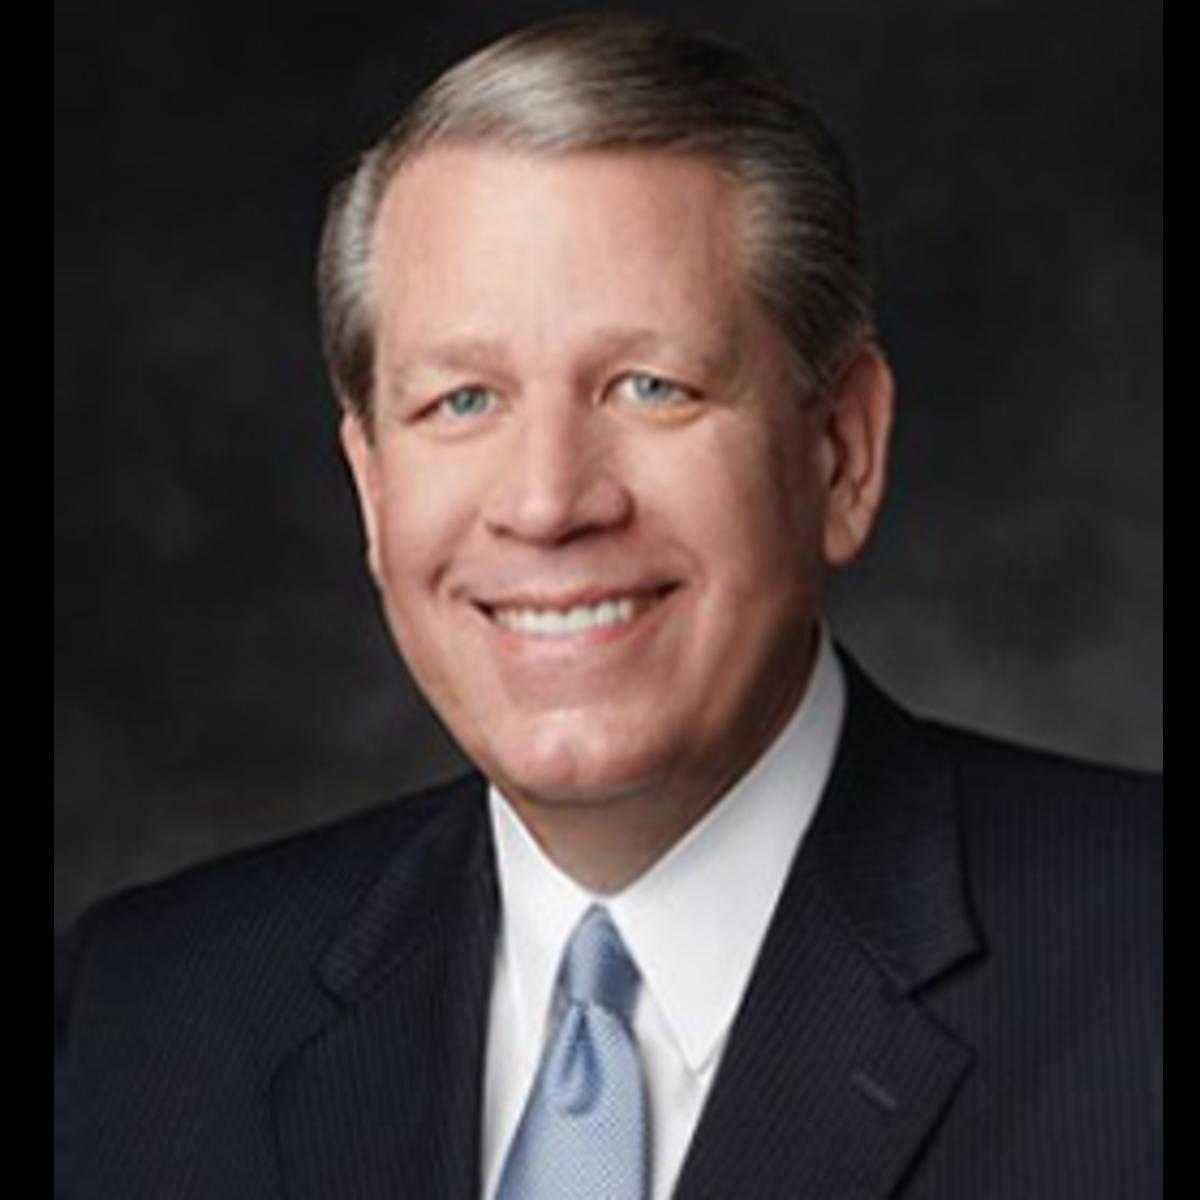 Donald L. Hallstrom